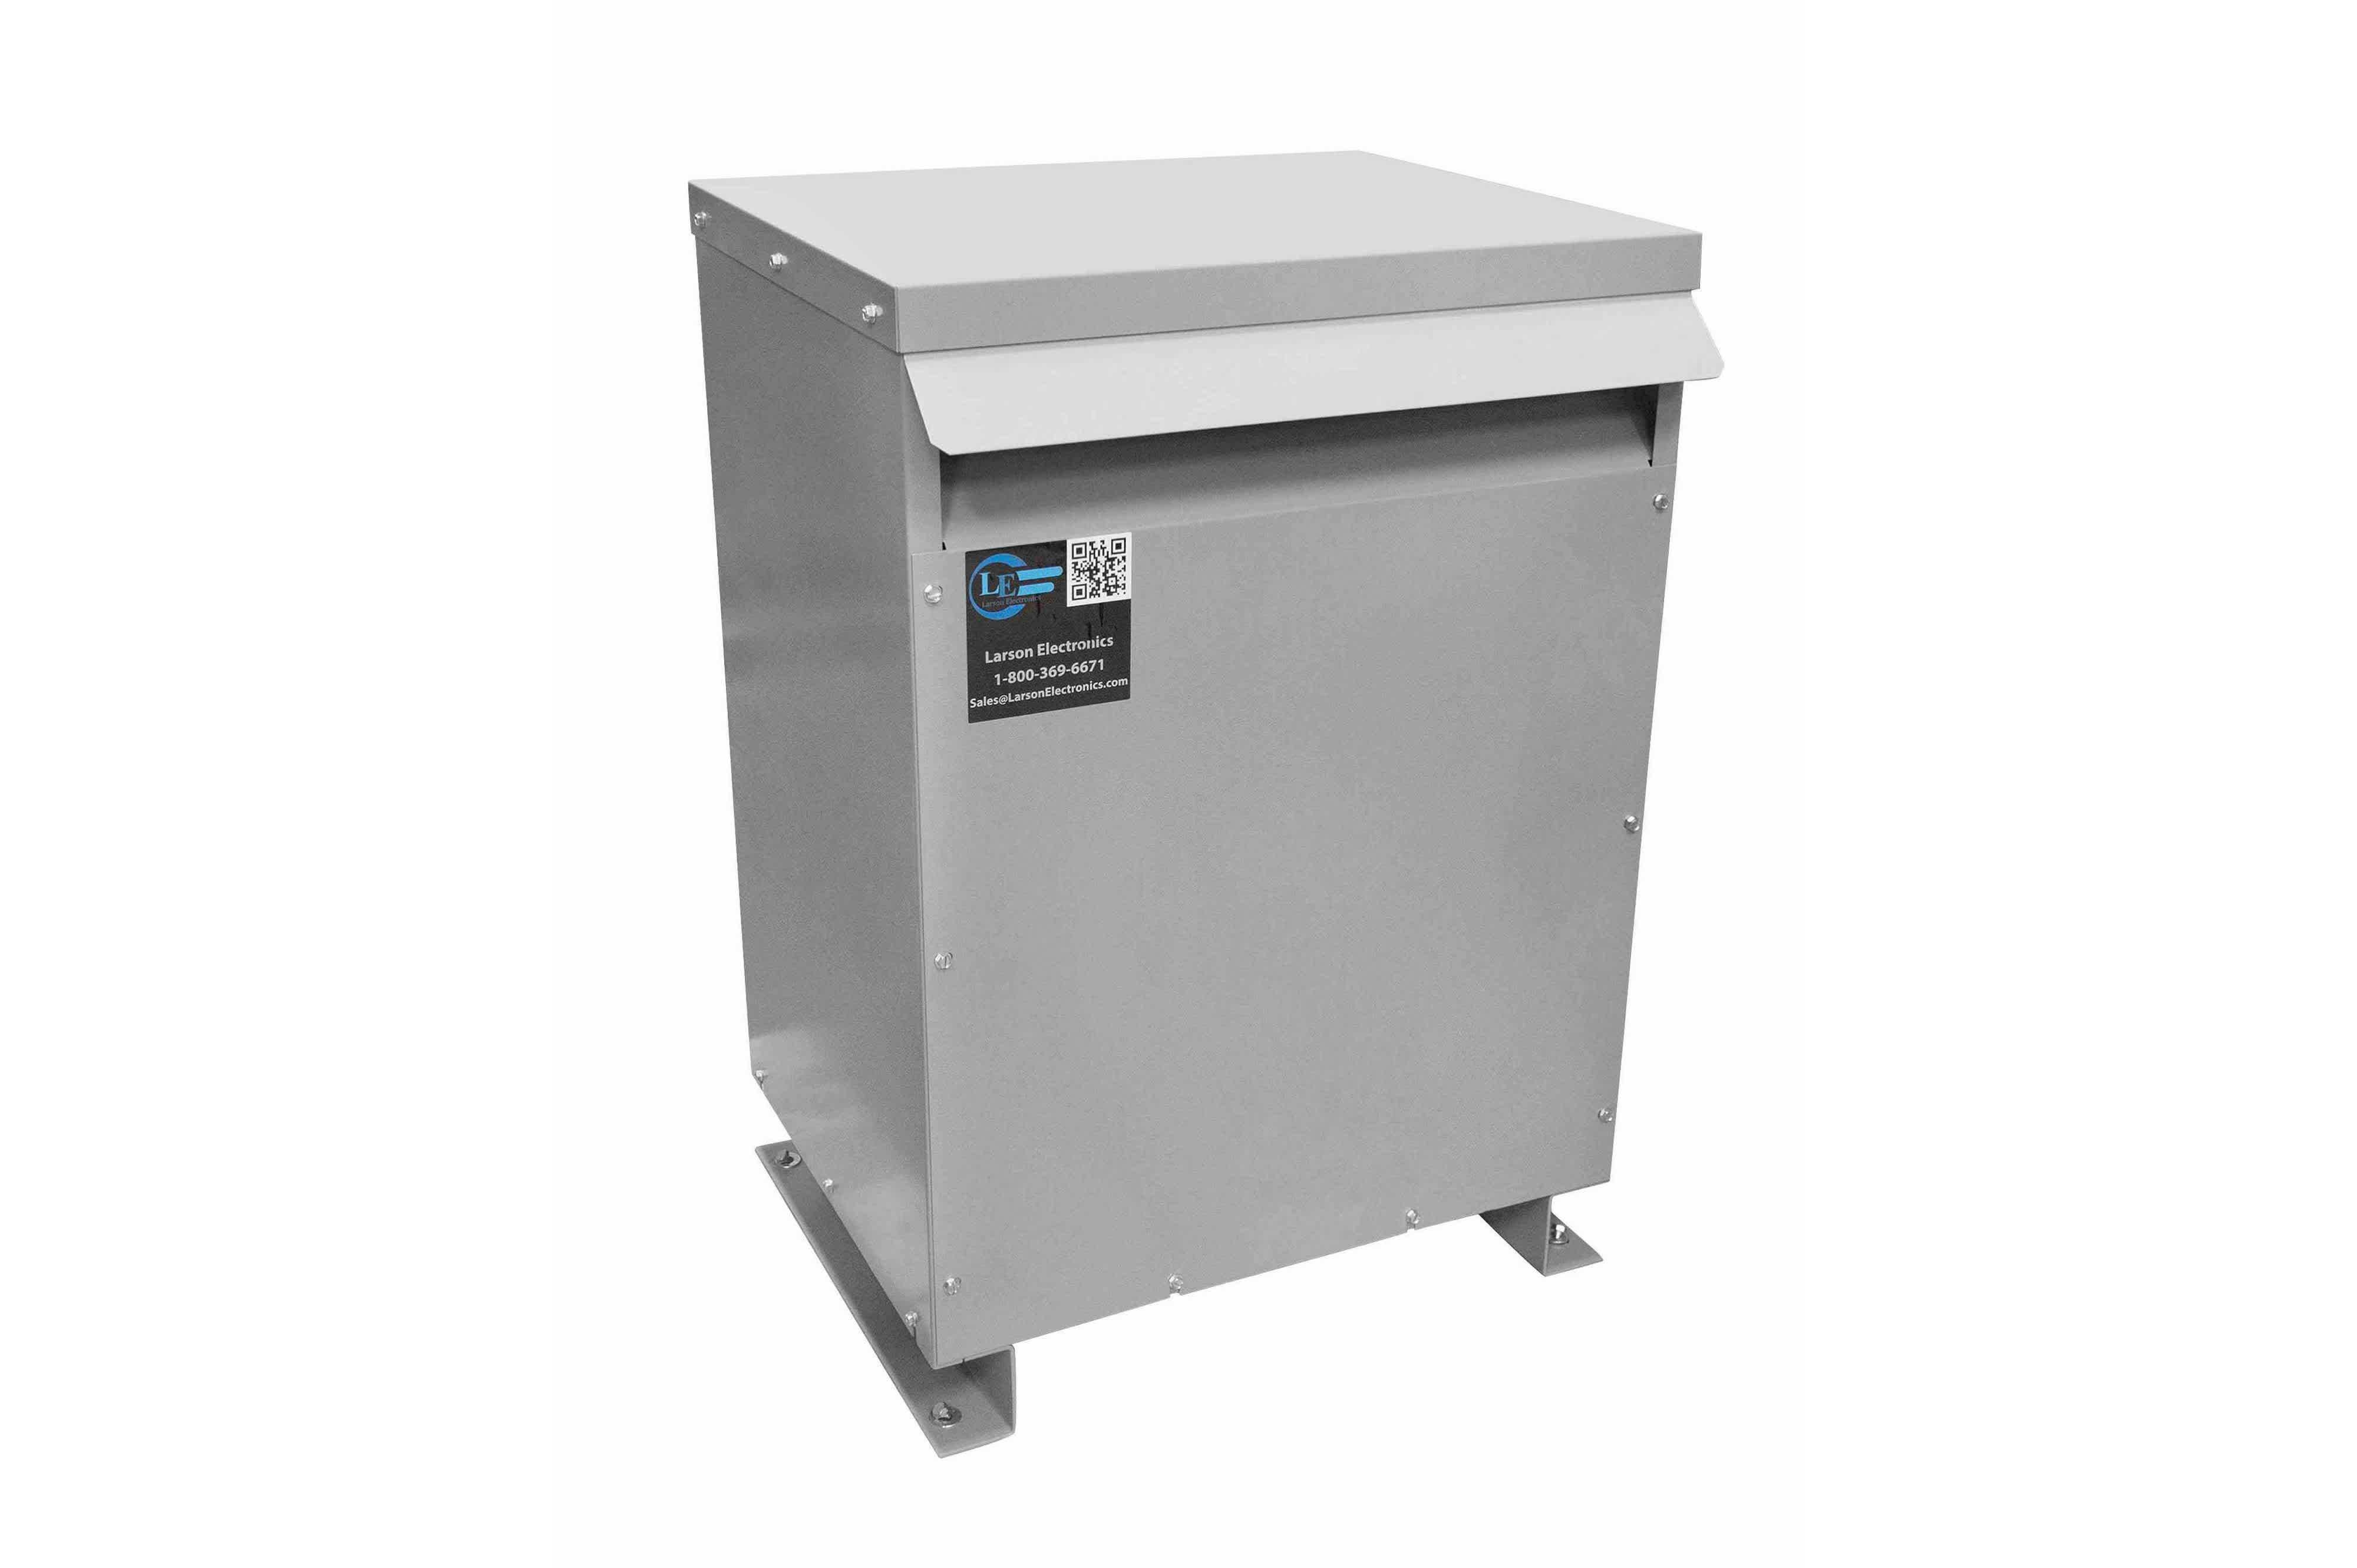 100 kVA 3PH Isolation Transformer, 220V Wye Primary, 208V Delta Secondary, N3R, Ventilated, 60 Hz